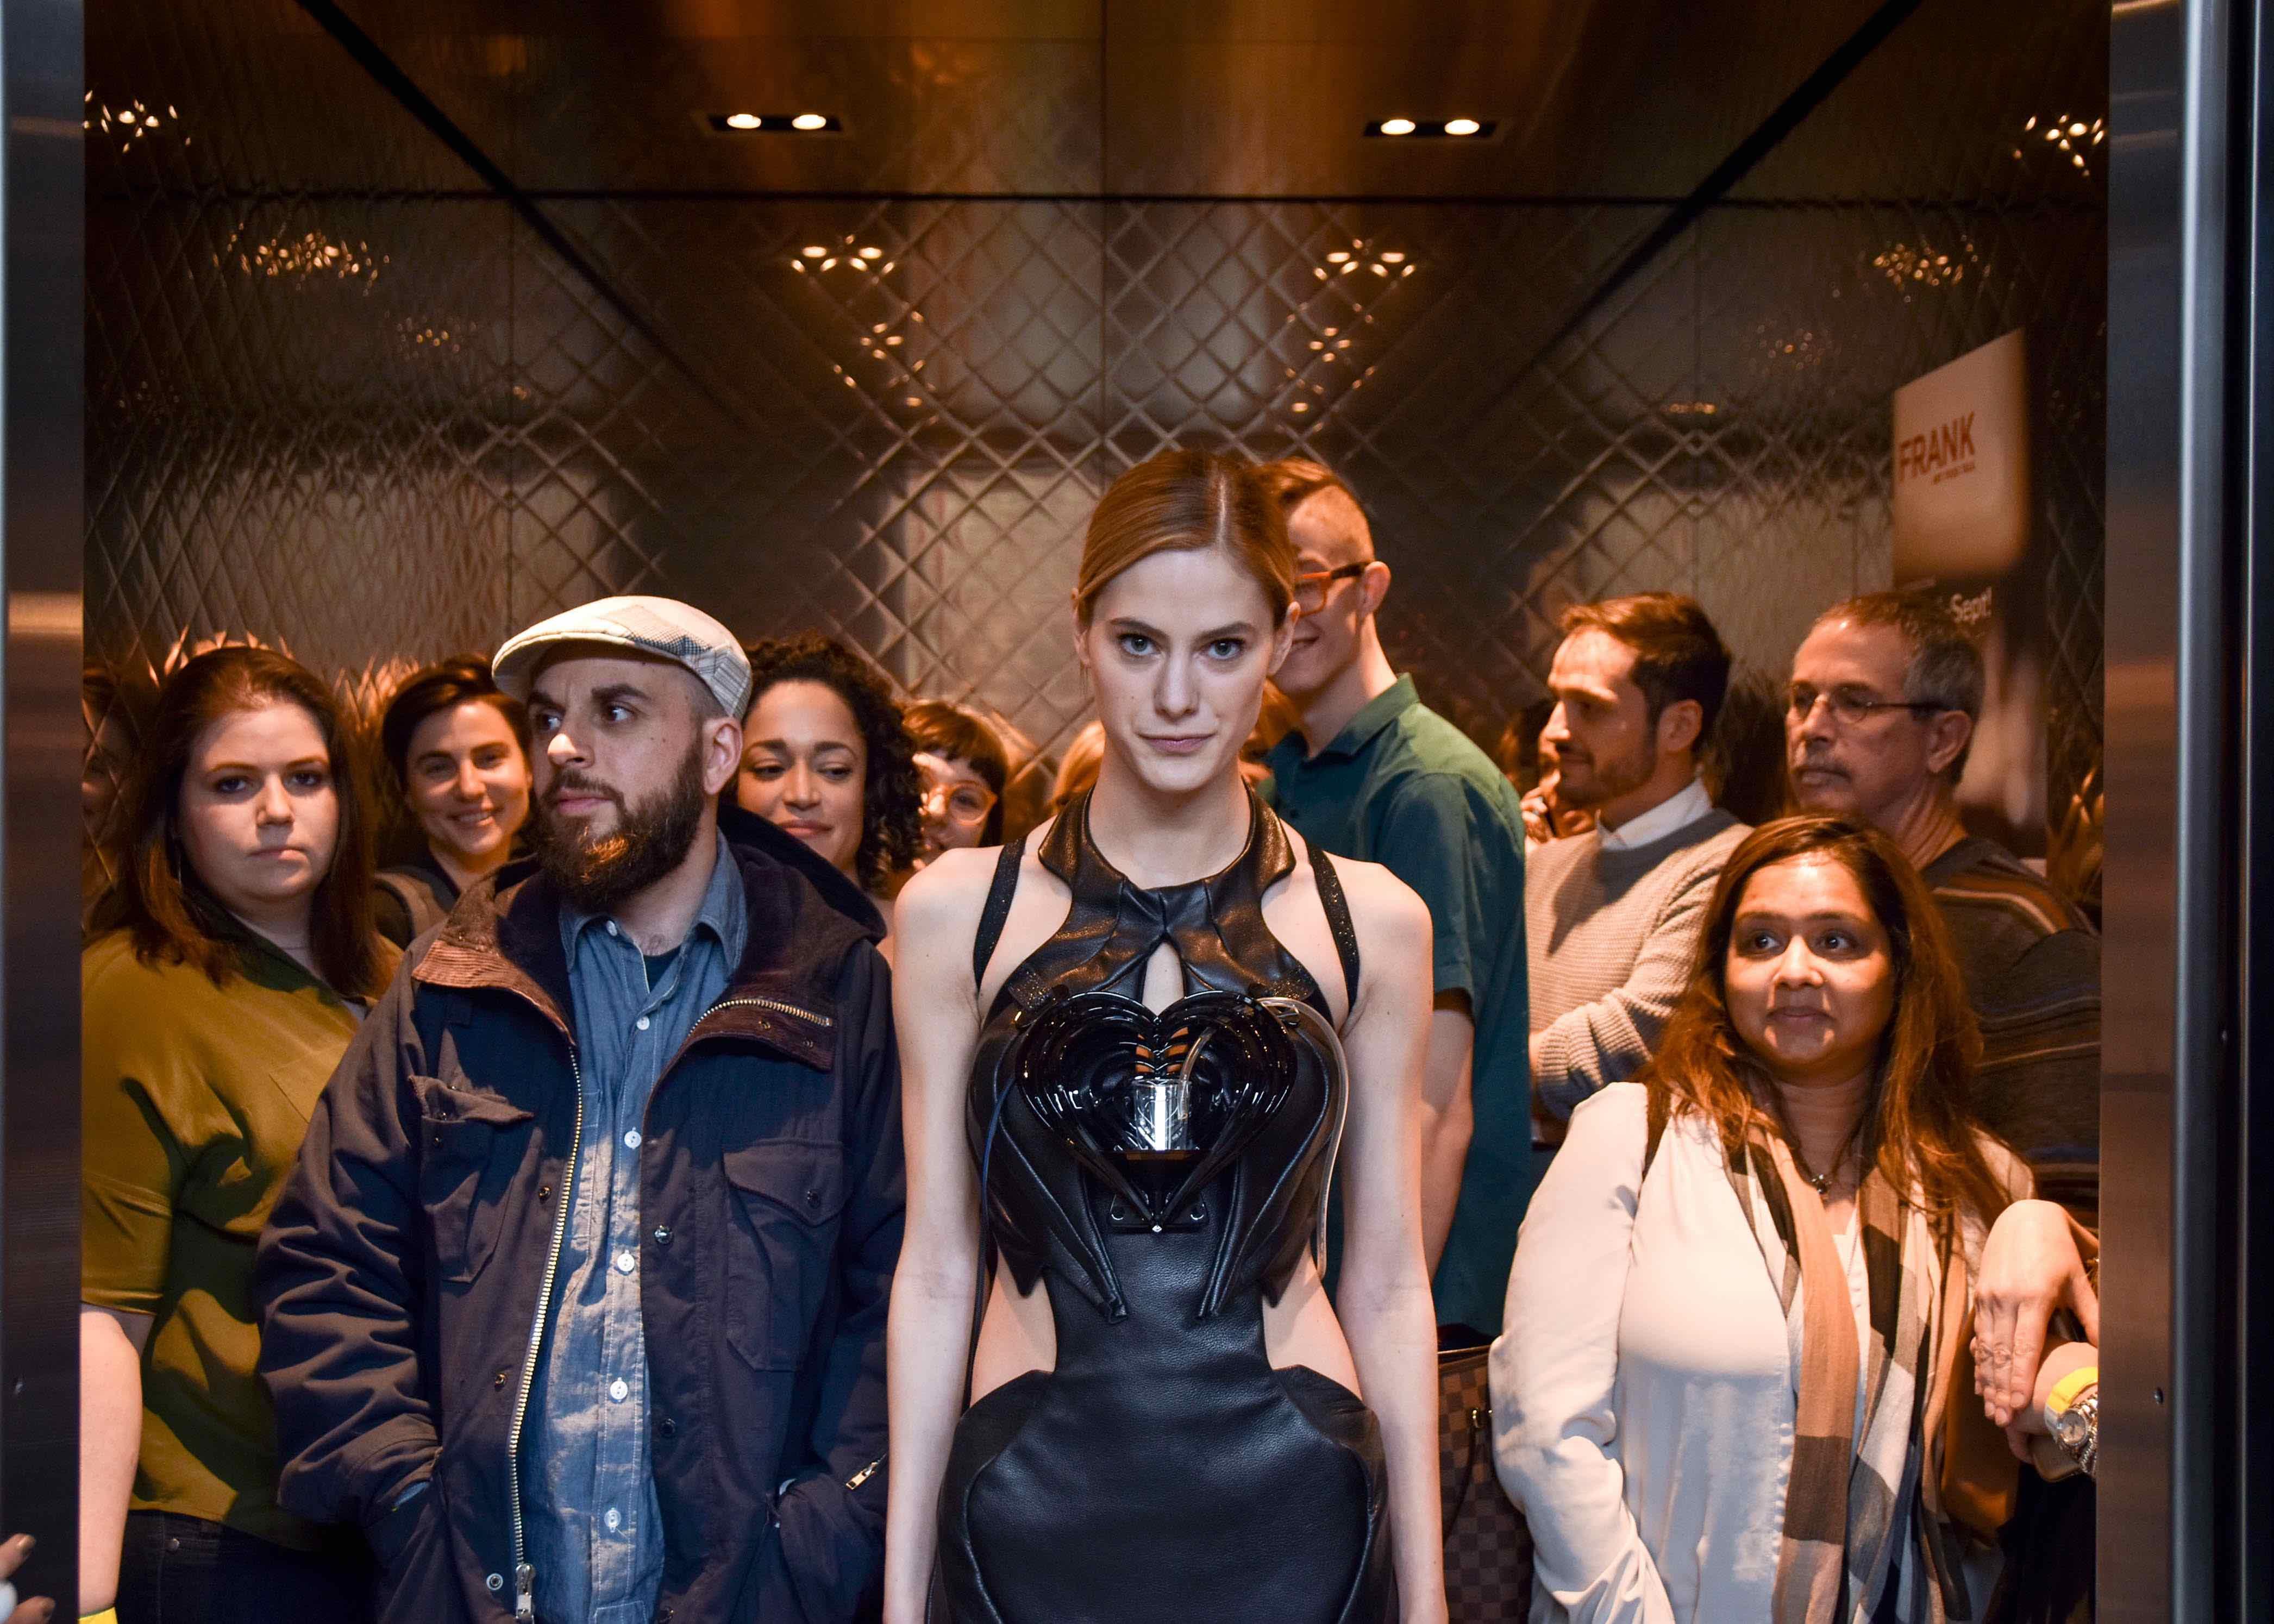 Anouk Wipprecht debuts Drinkbot Dress in Toronto